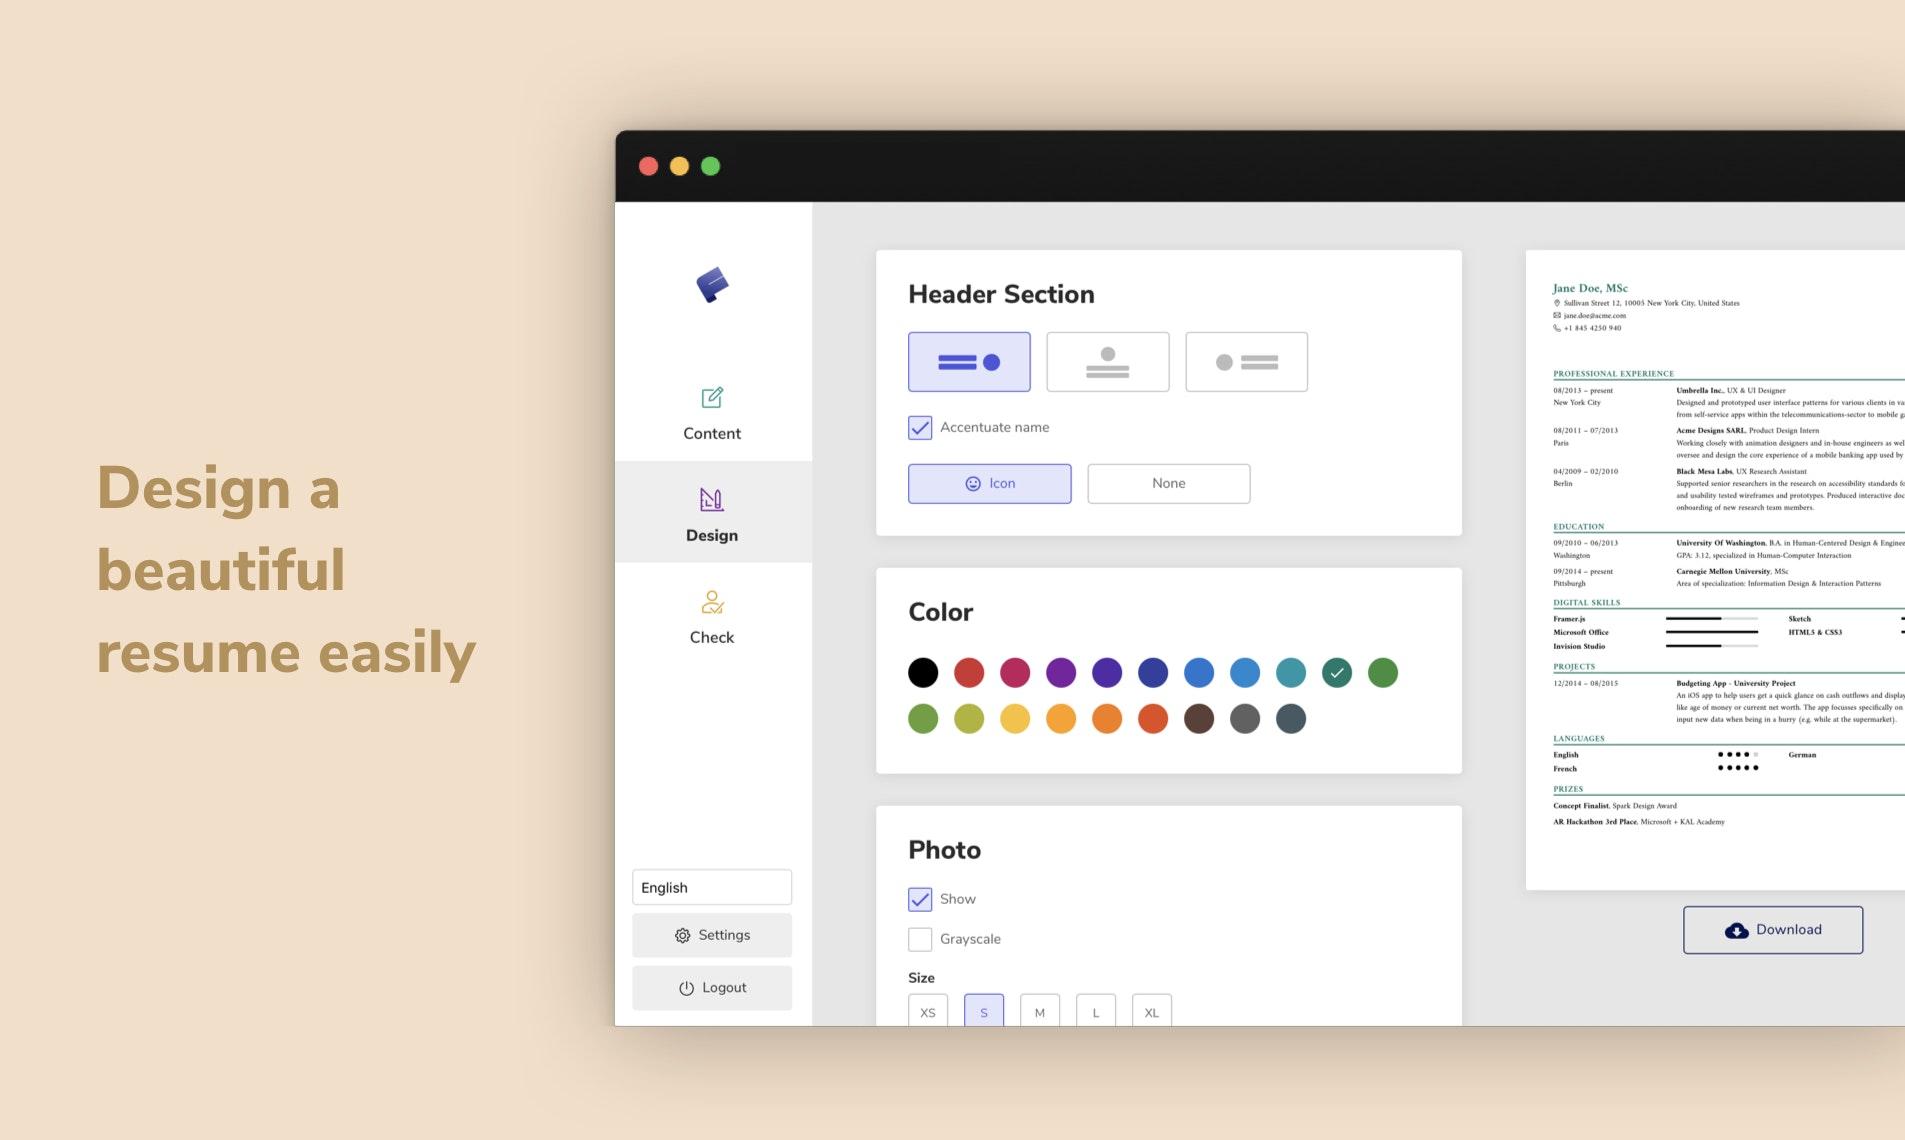 FlowCV - Create a beautiful resume & customize it easily